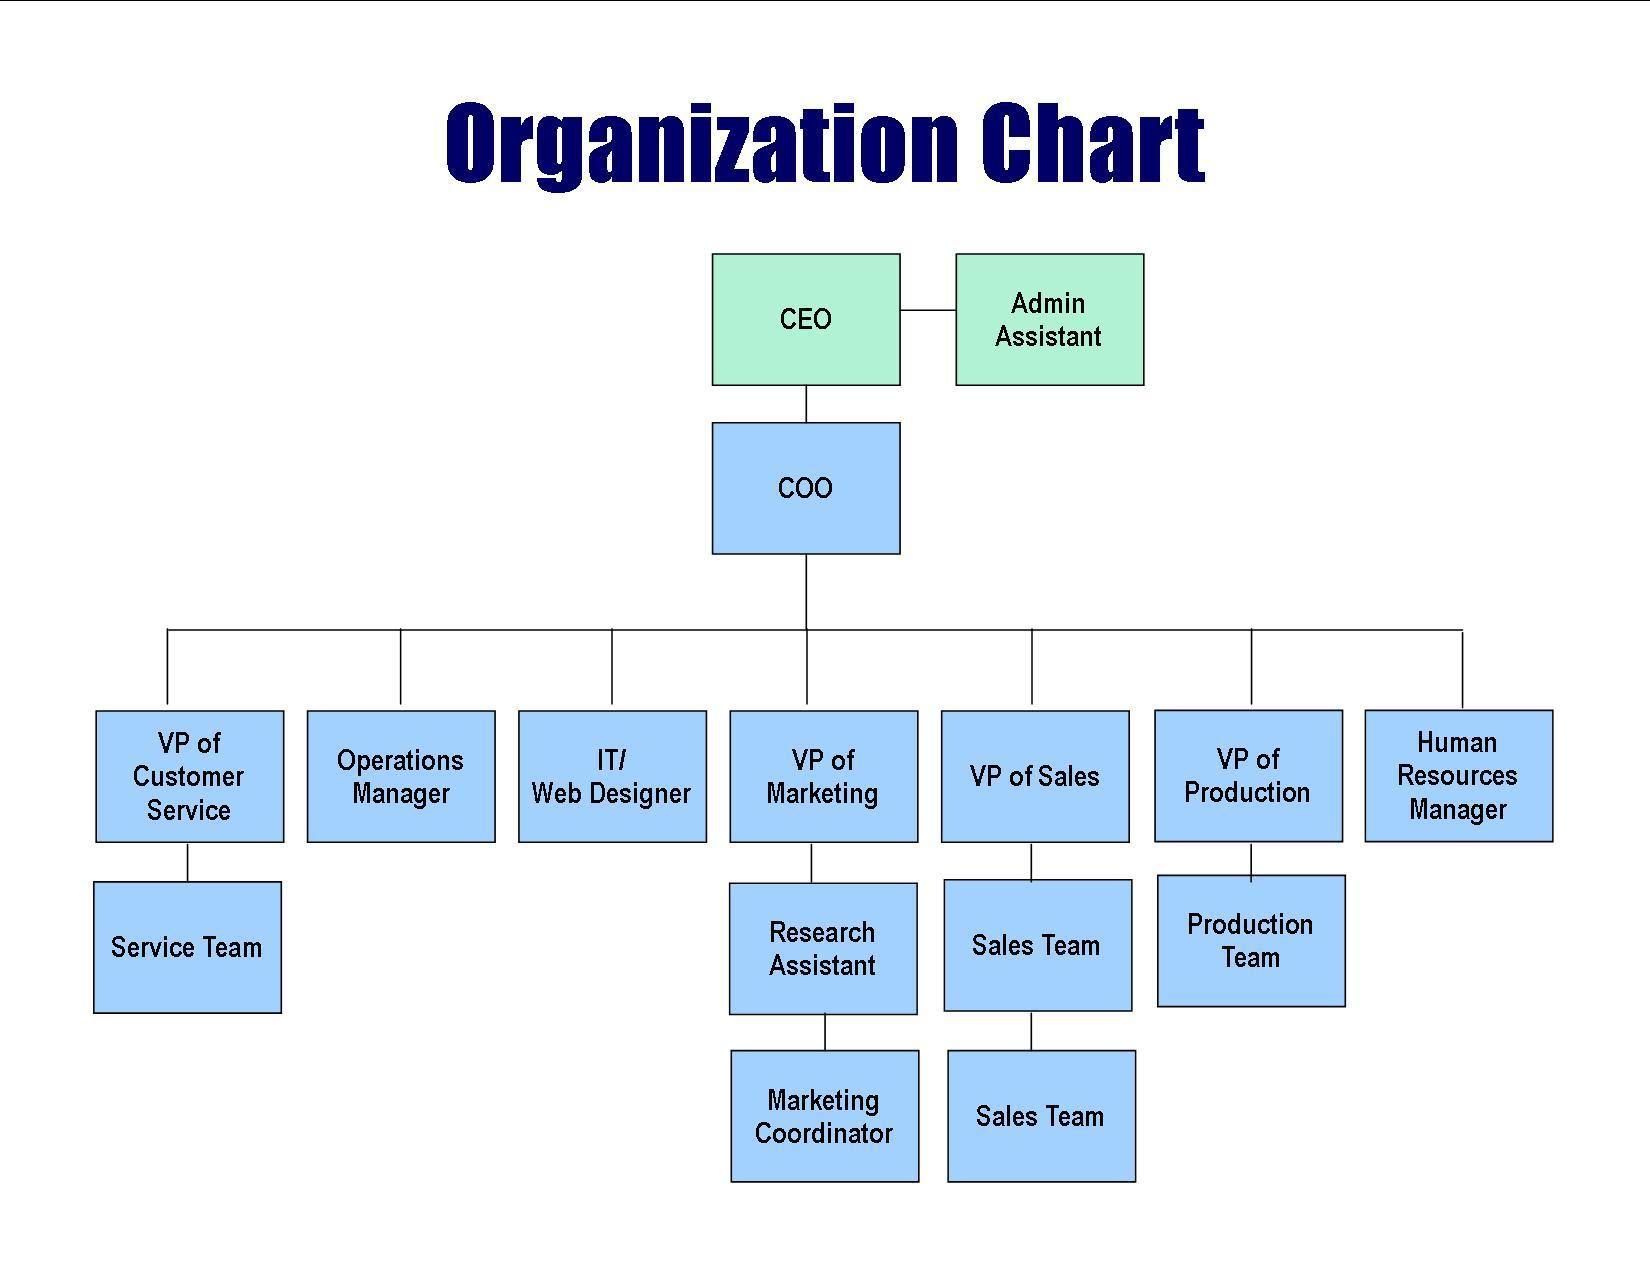 Hospital organizational chart template success chainimage also charts rh pinterest